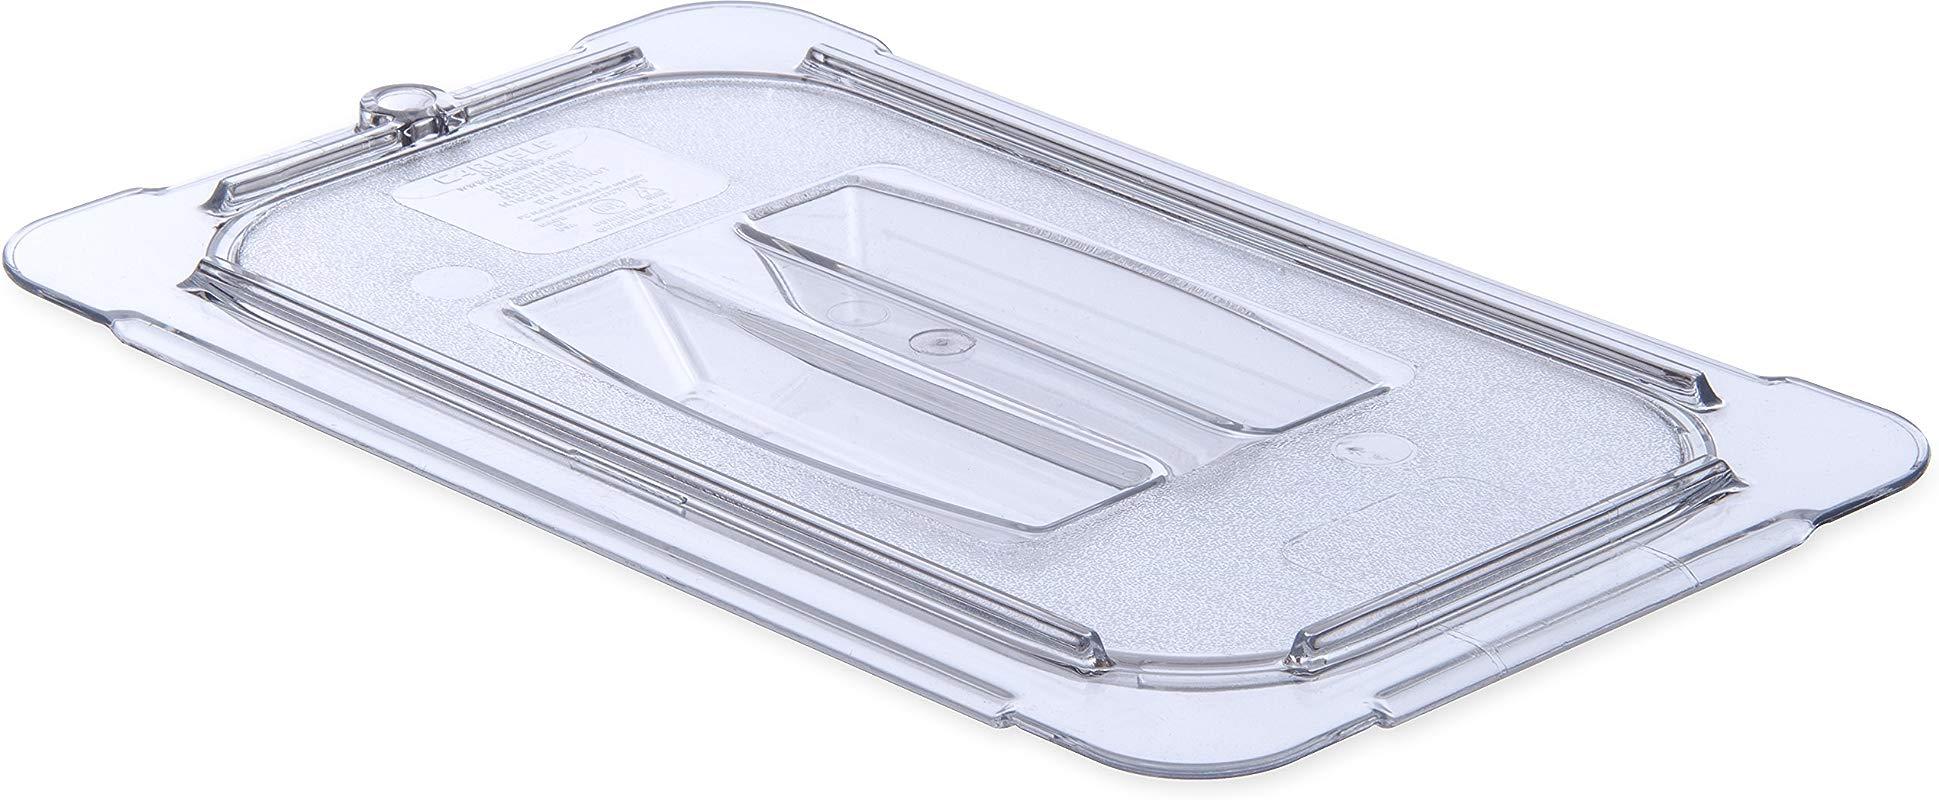 Carlisle 10290U07 StorPlus Quarter Size Polycarbonate Universal Handled Food Pan Lid Clear